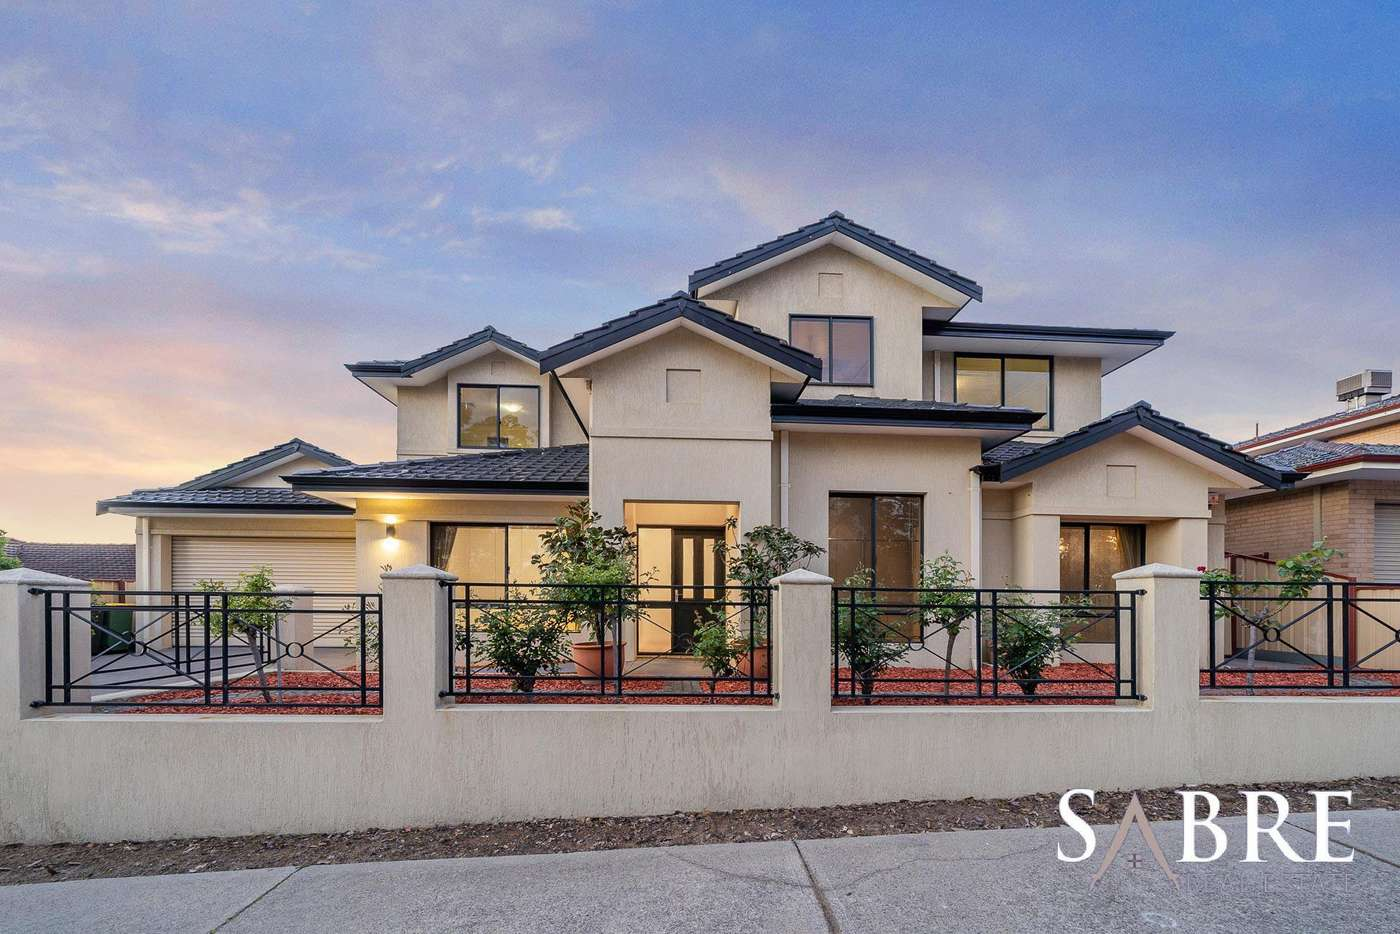 Main view of Homely house listing, 1B Recreation Road, Kalamunda WA 6076